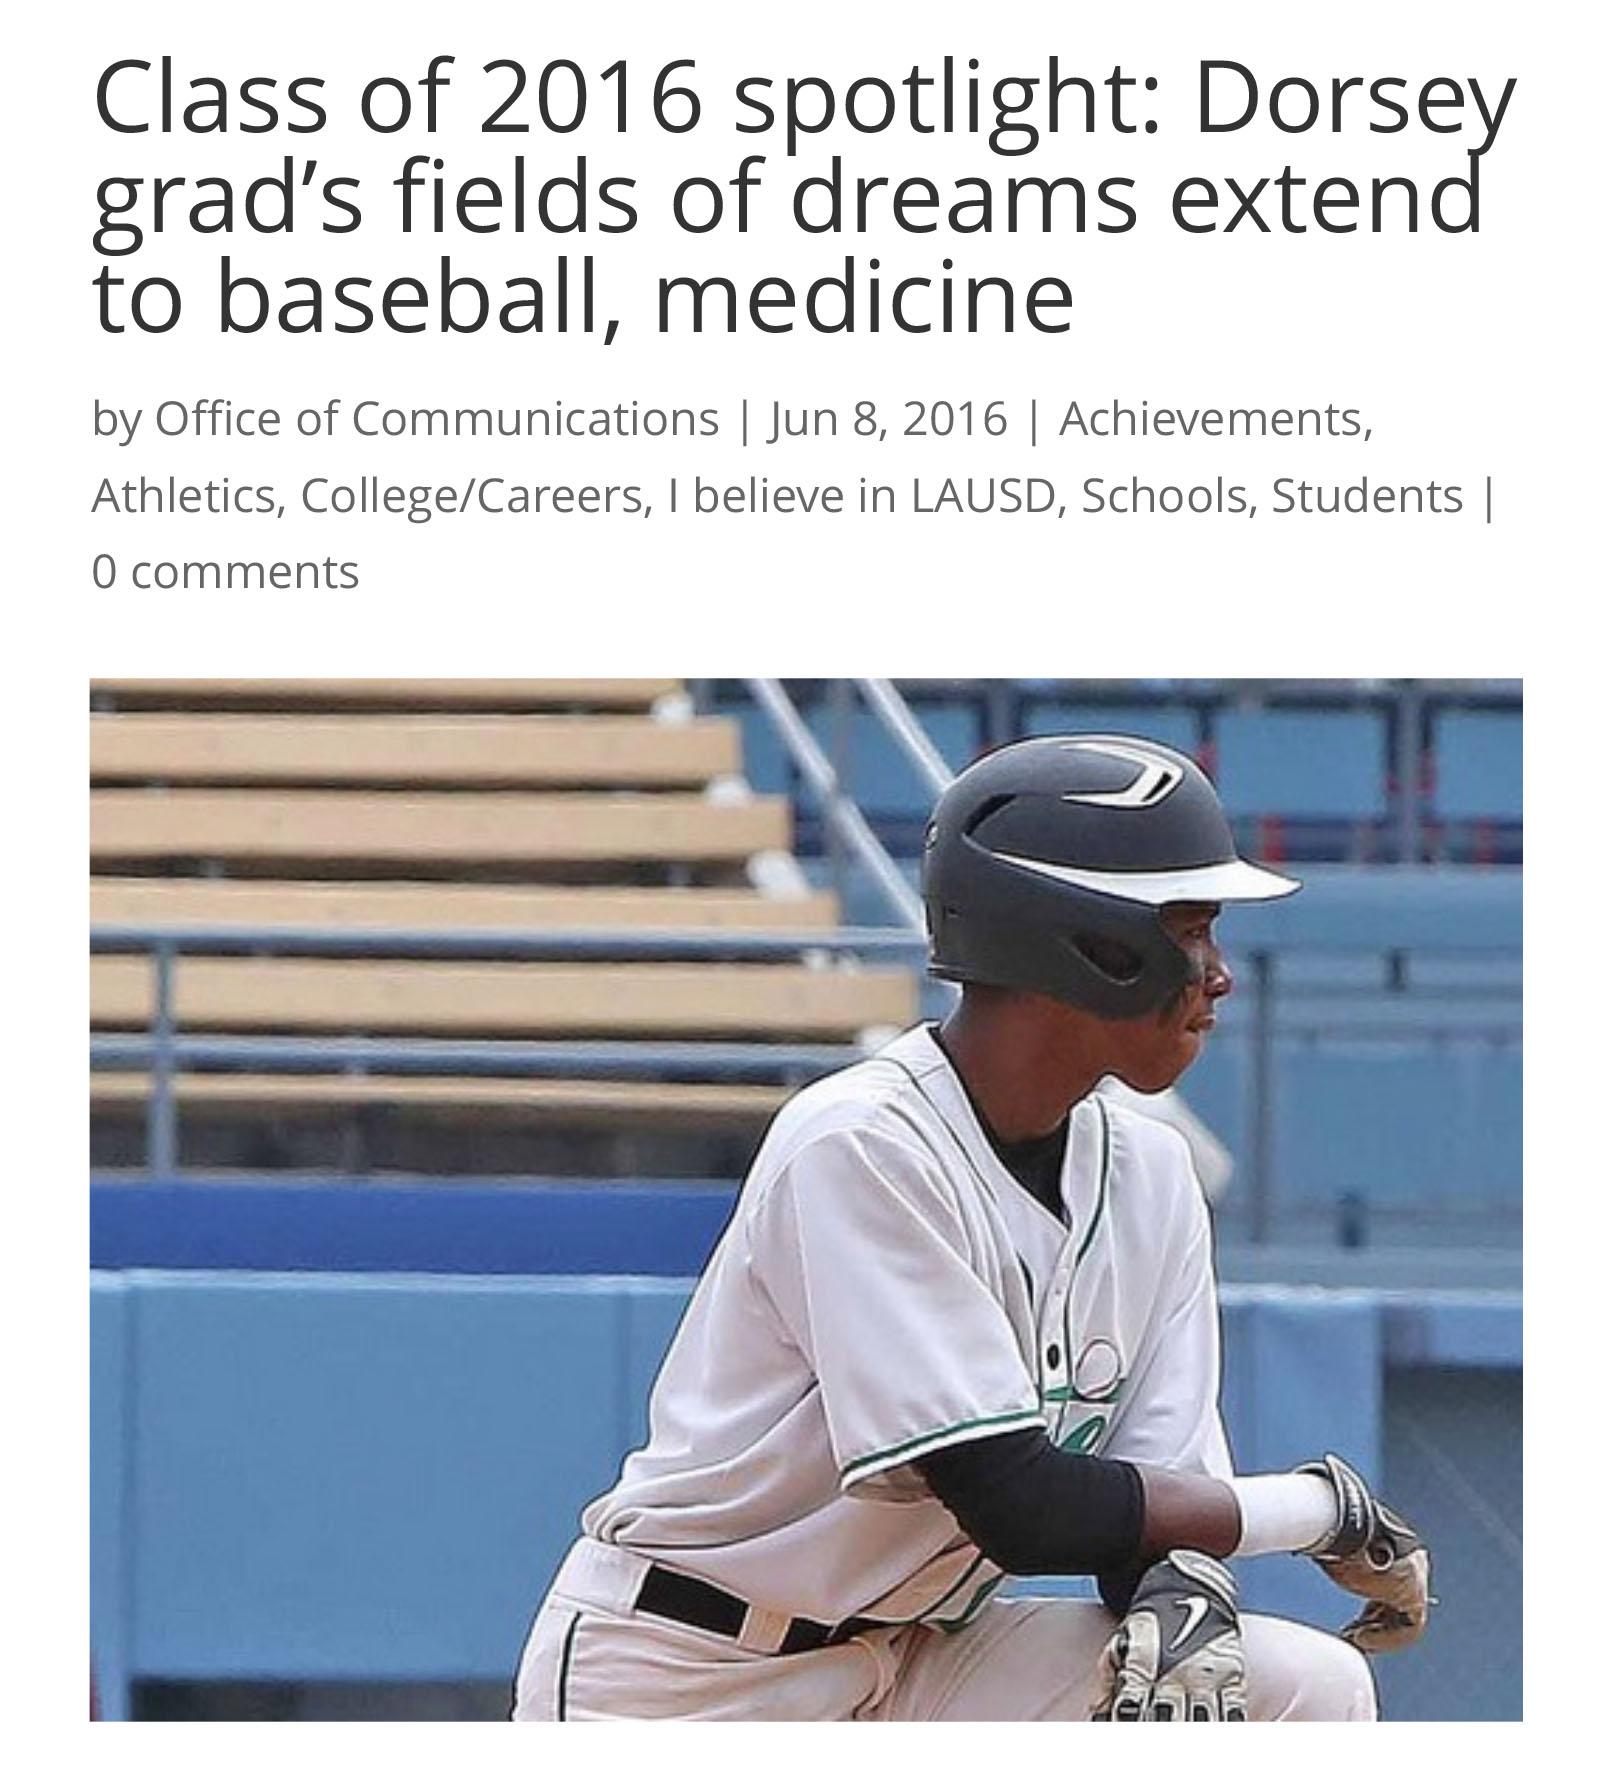 Class of 2016 spotlight: Dorsey grad's fields of dreams extend